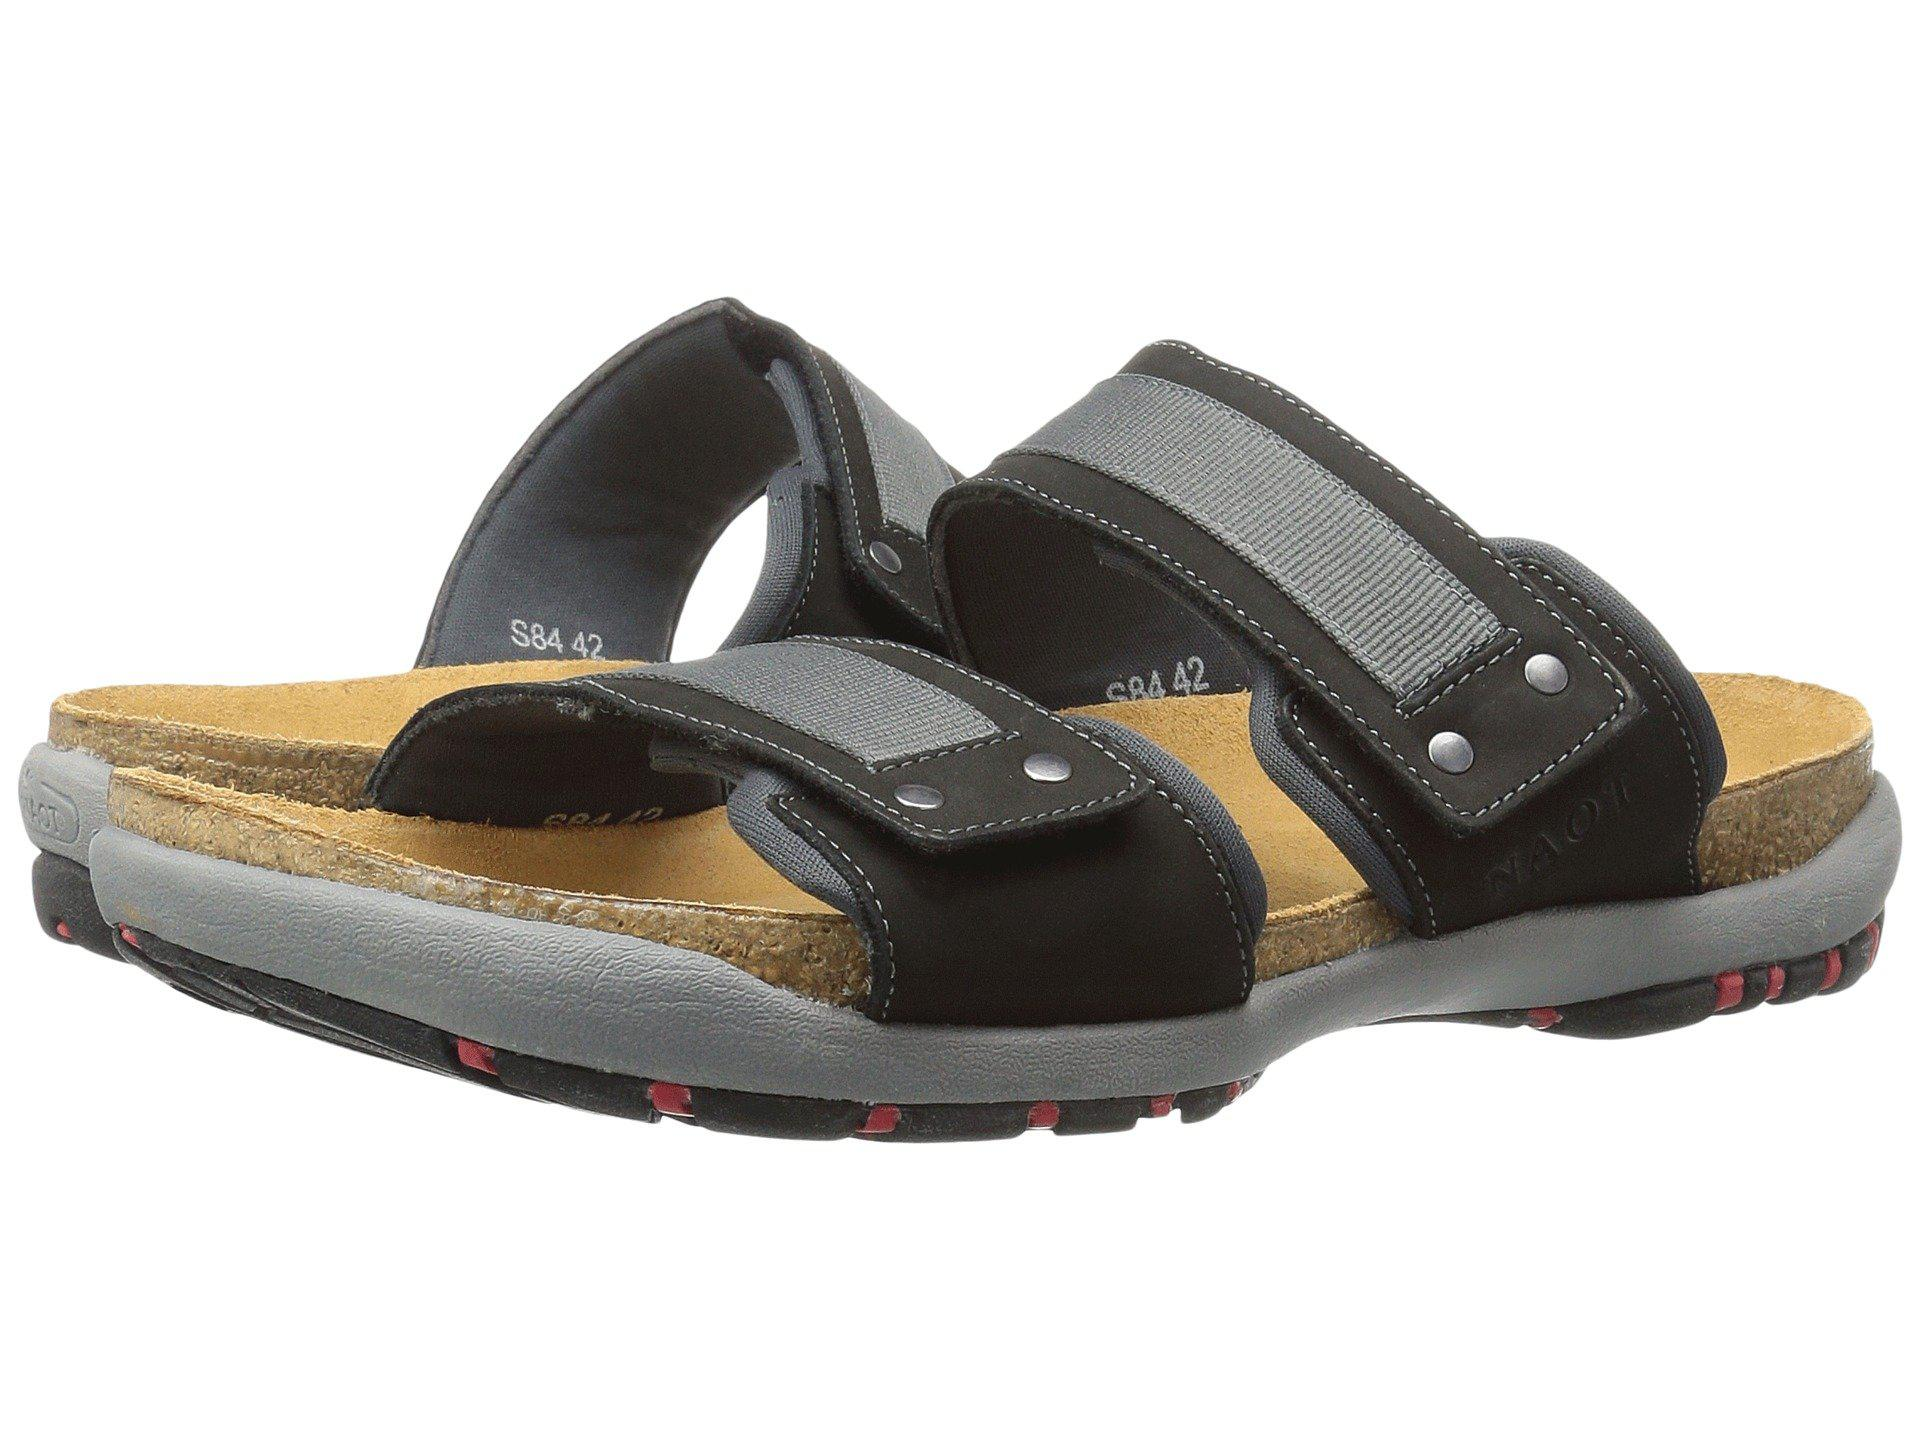 1dcba87031cf Lyst - Naot Climb (bison Leather) Men s Sandals in Black for Men